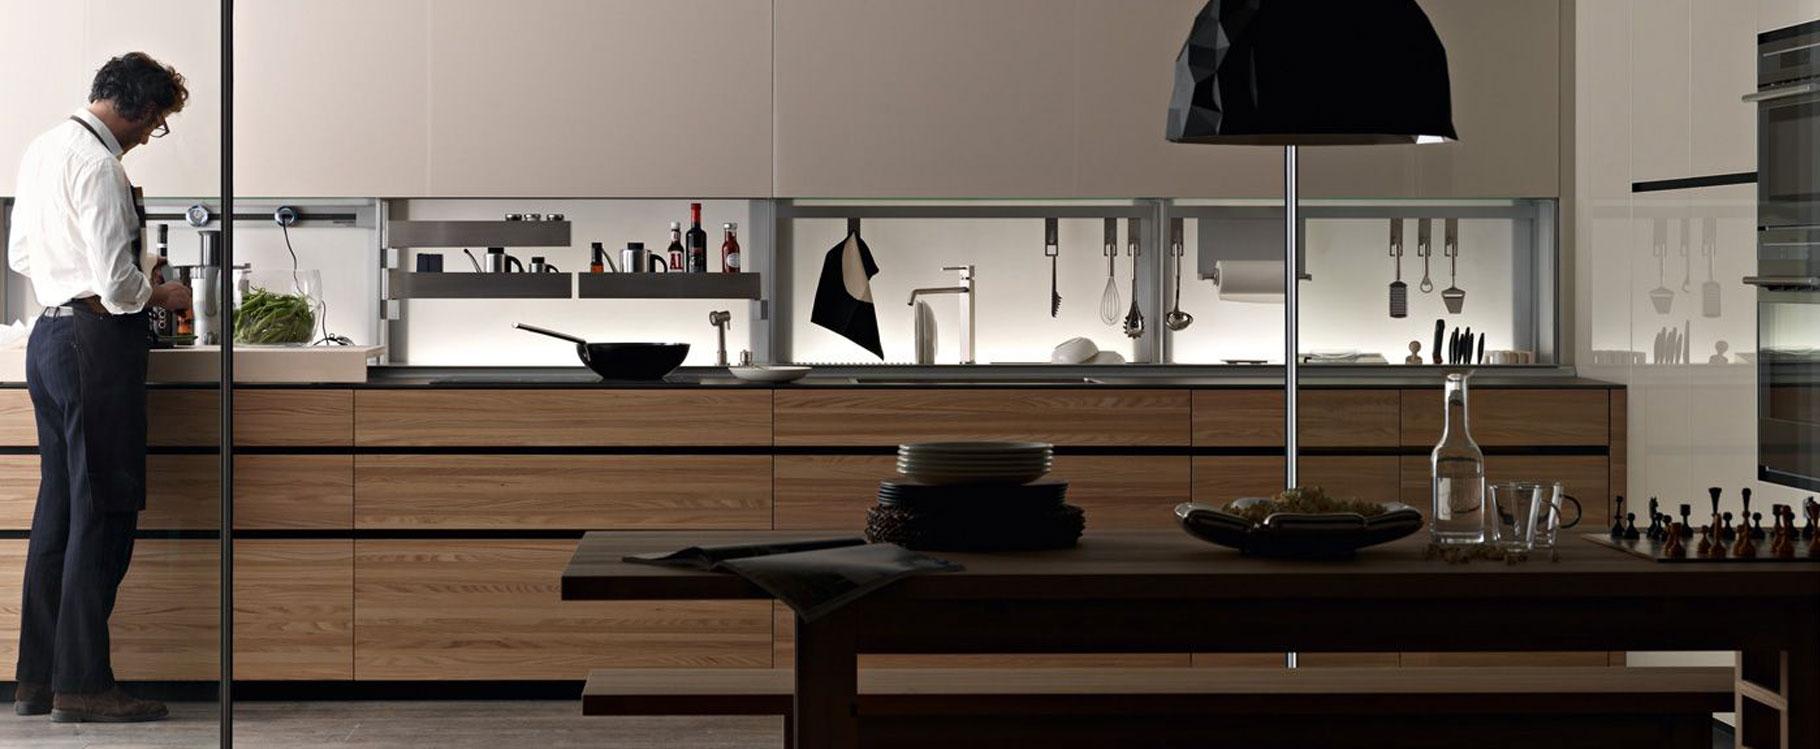 Cucine Como, Rivenditori Cucine Como, Valcucine Como, Ernestomeda Como